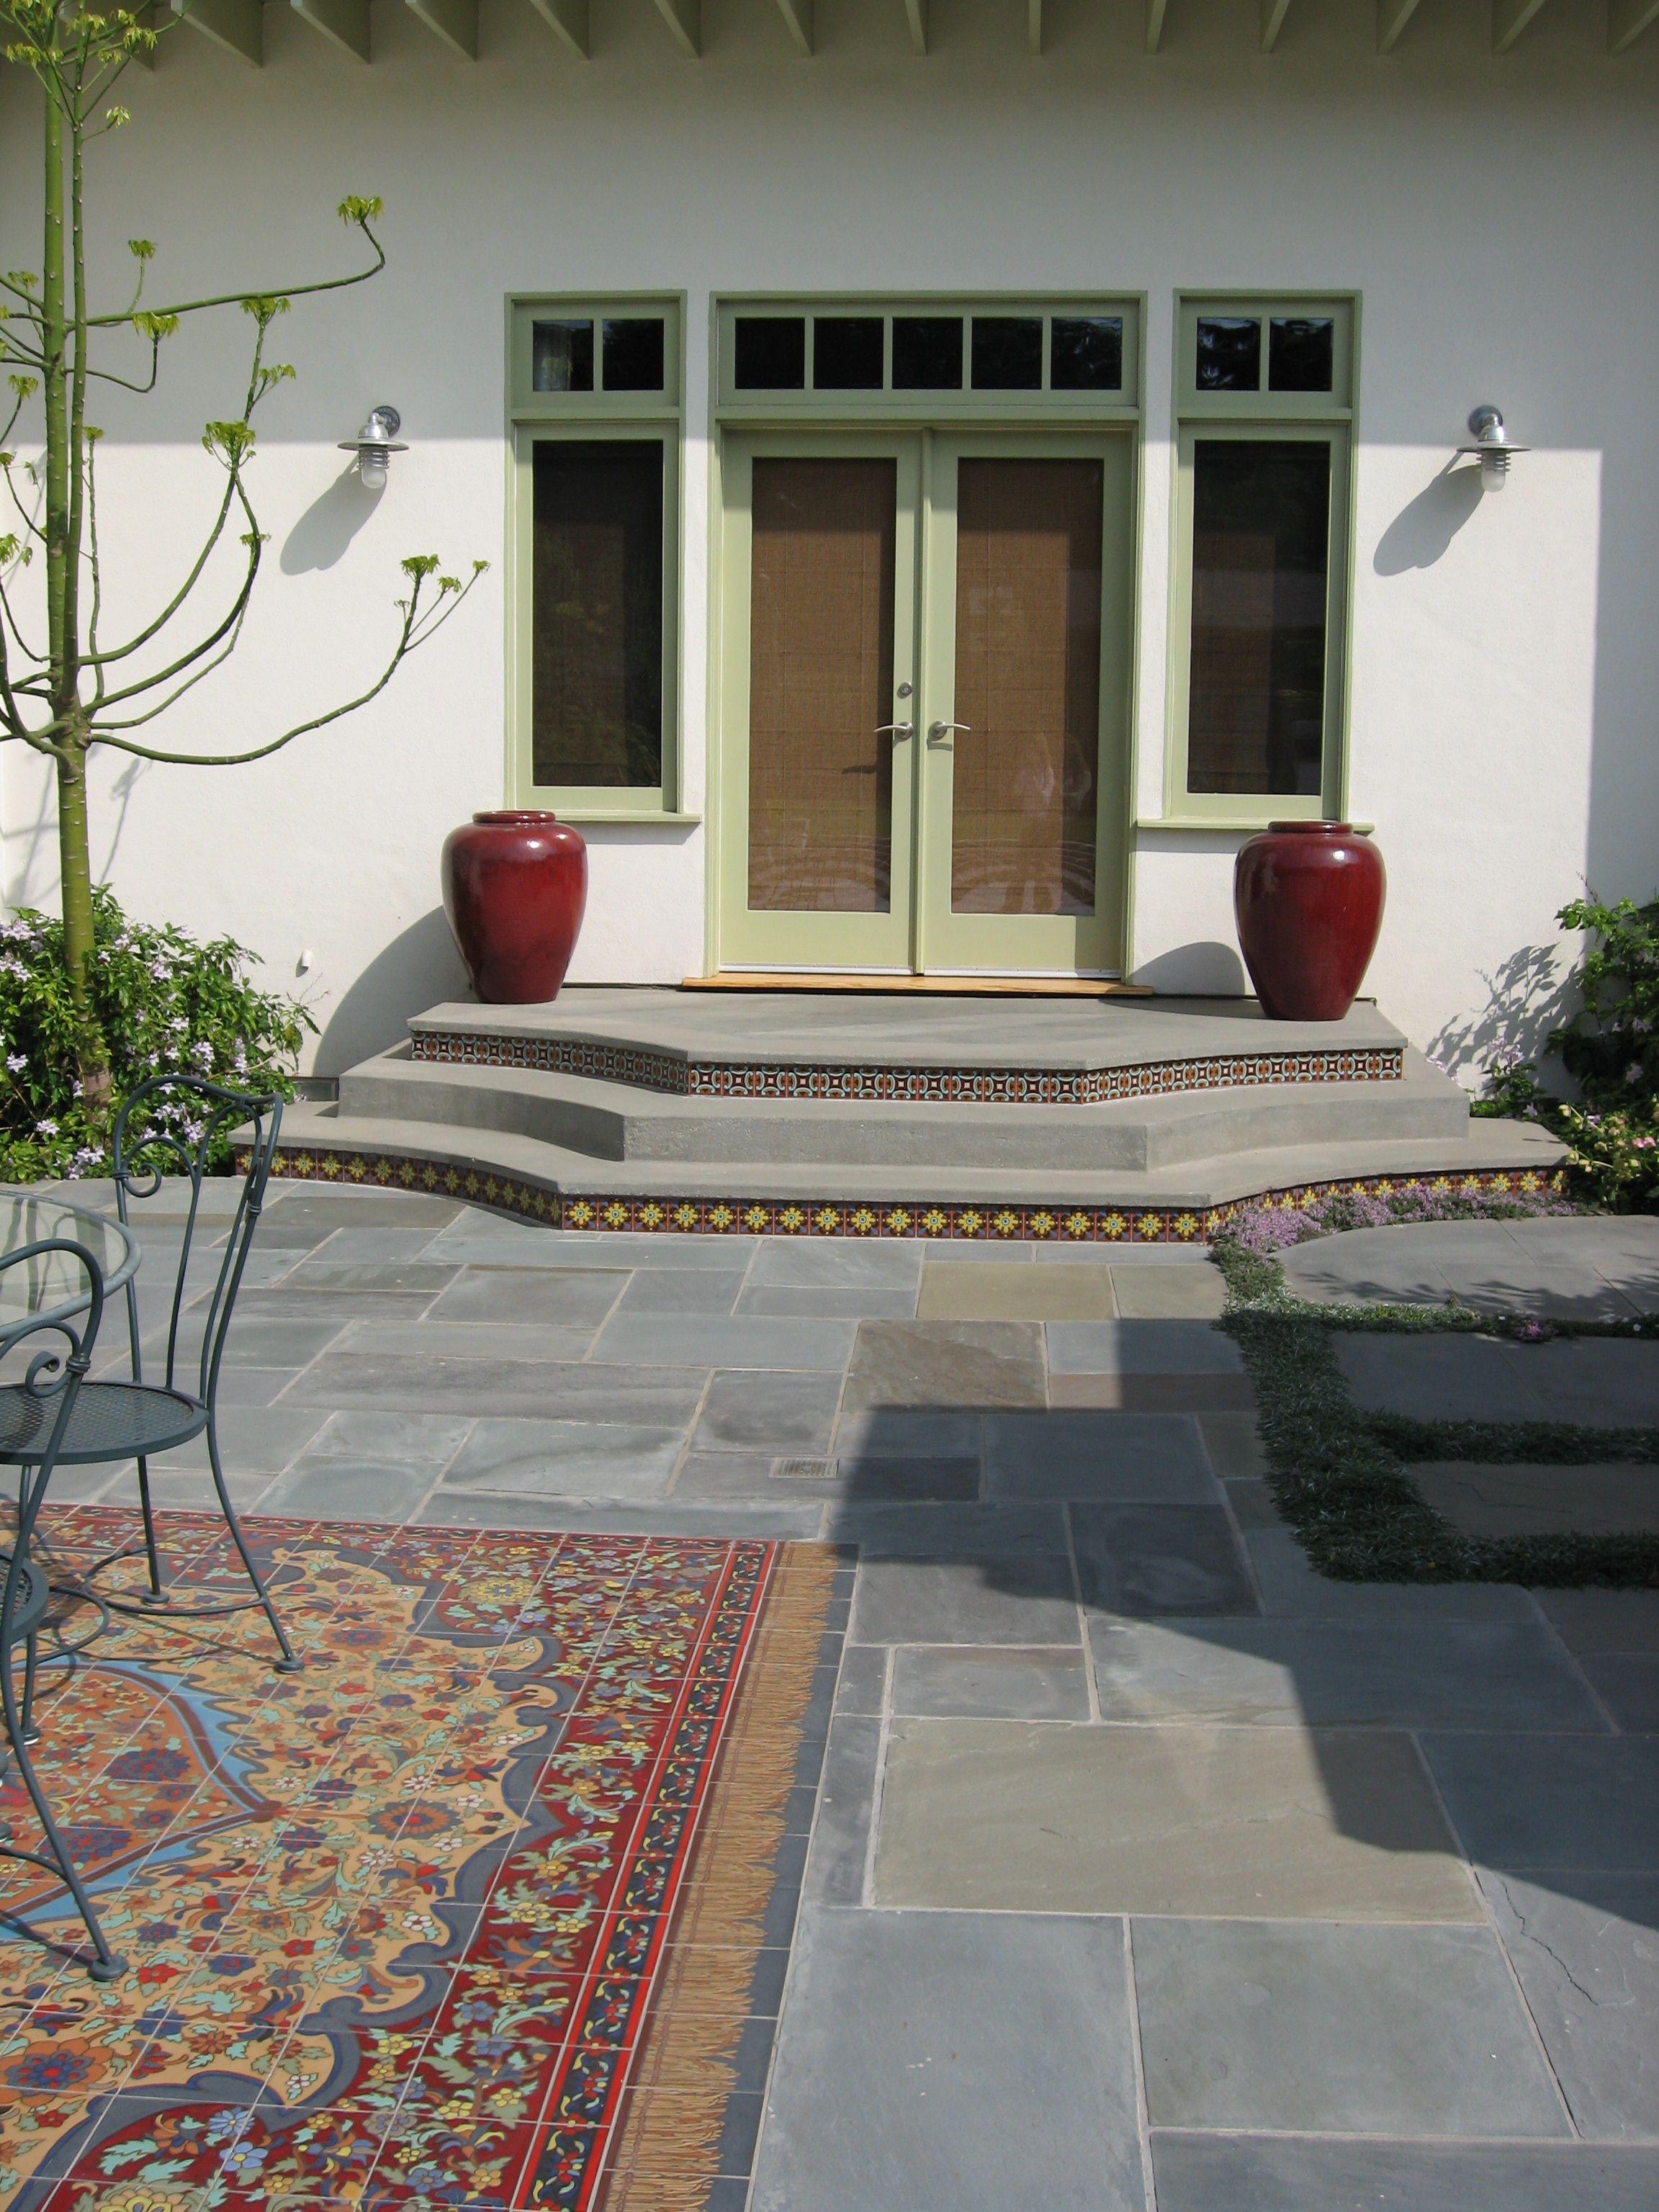 Painting Ceramic Tiles